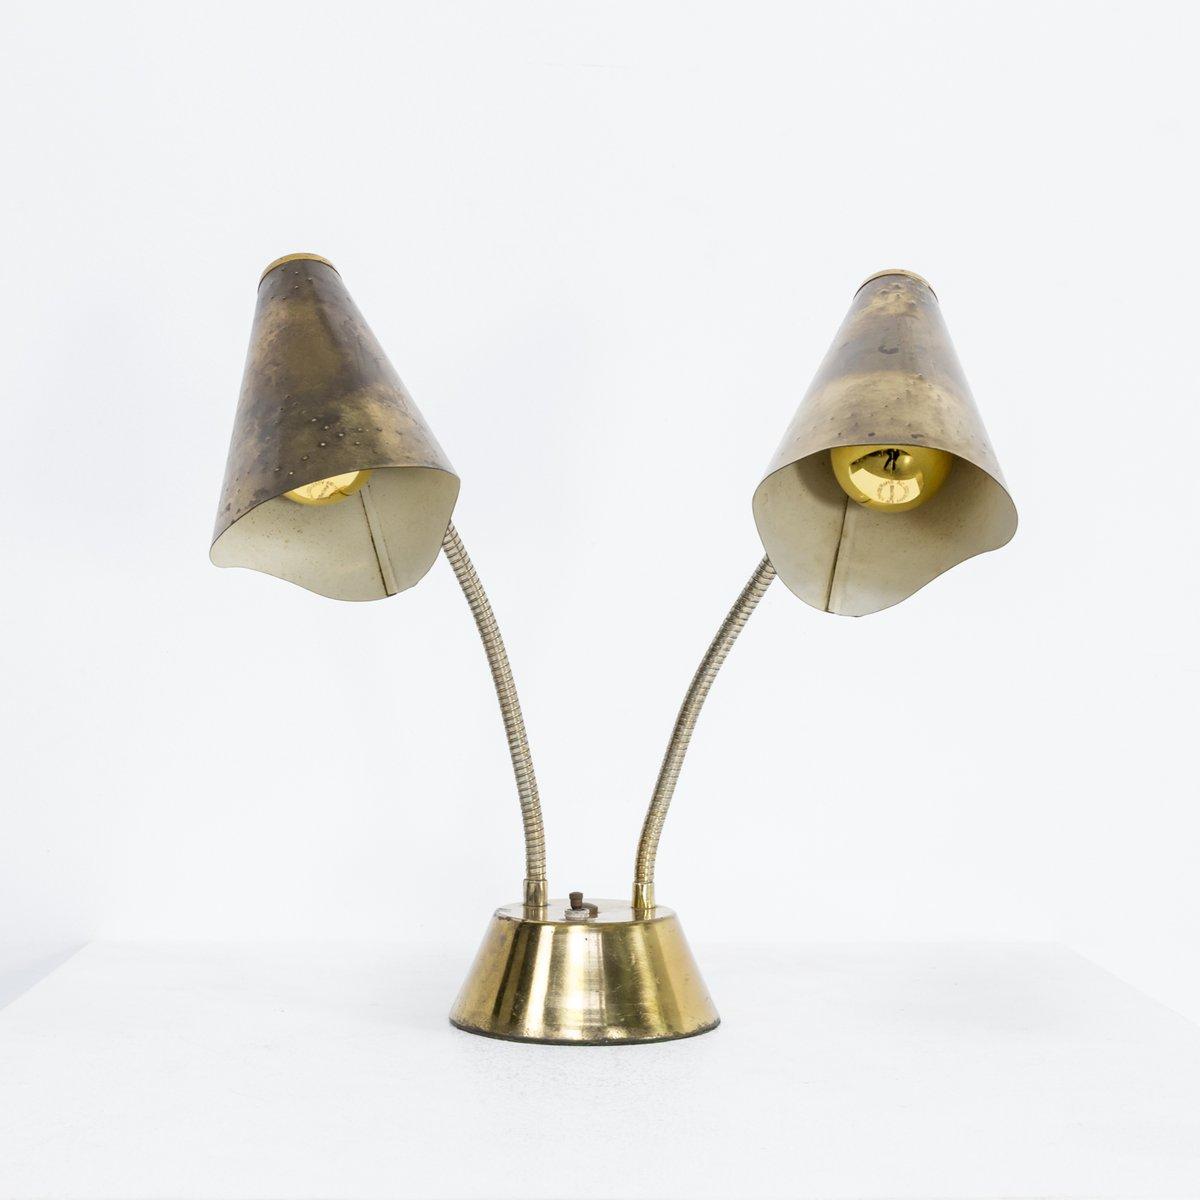 Doppelschalter Tischlampe aus Messing & Metall, 1960er